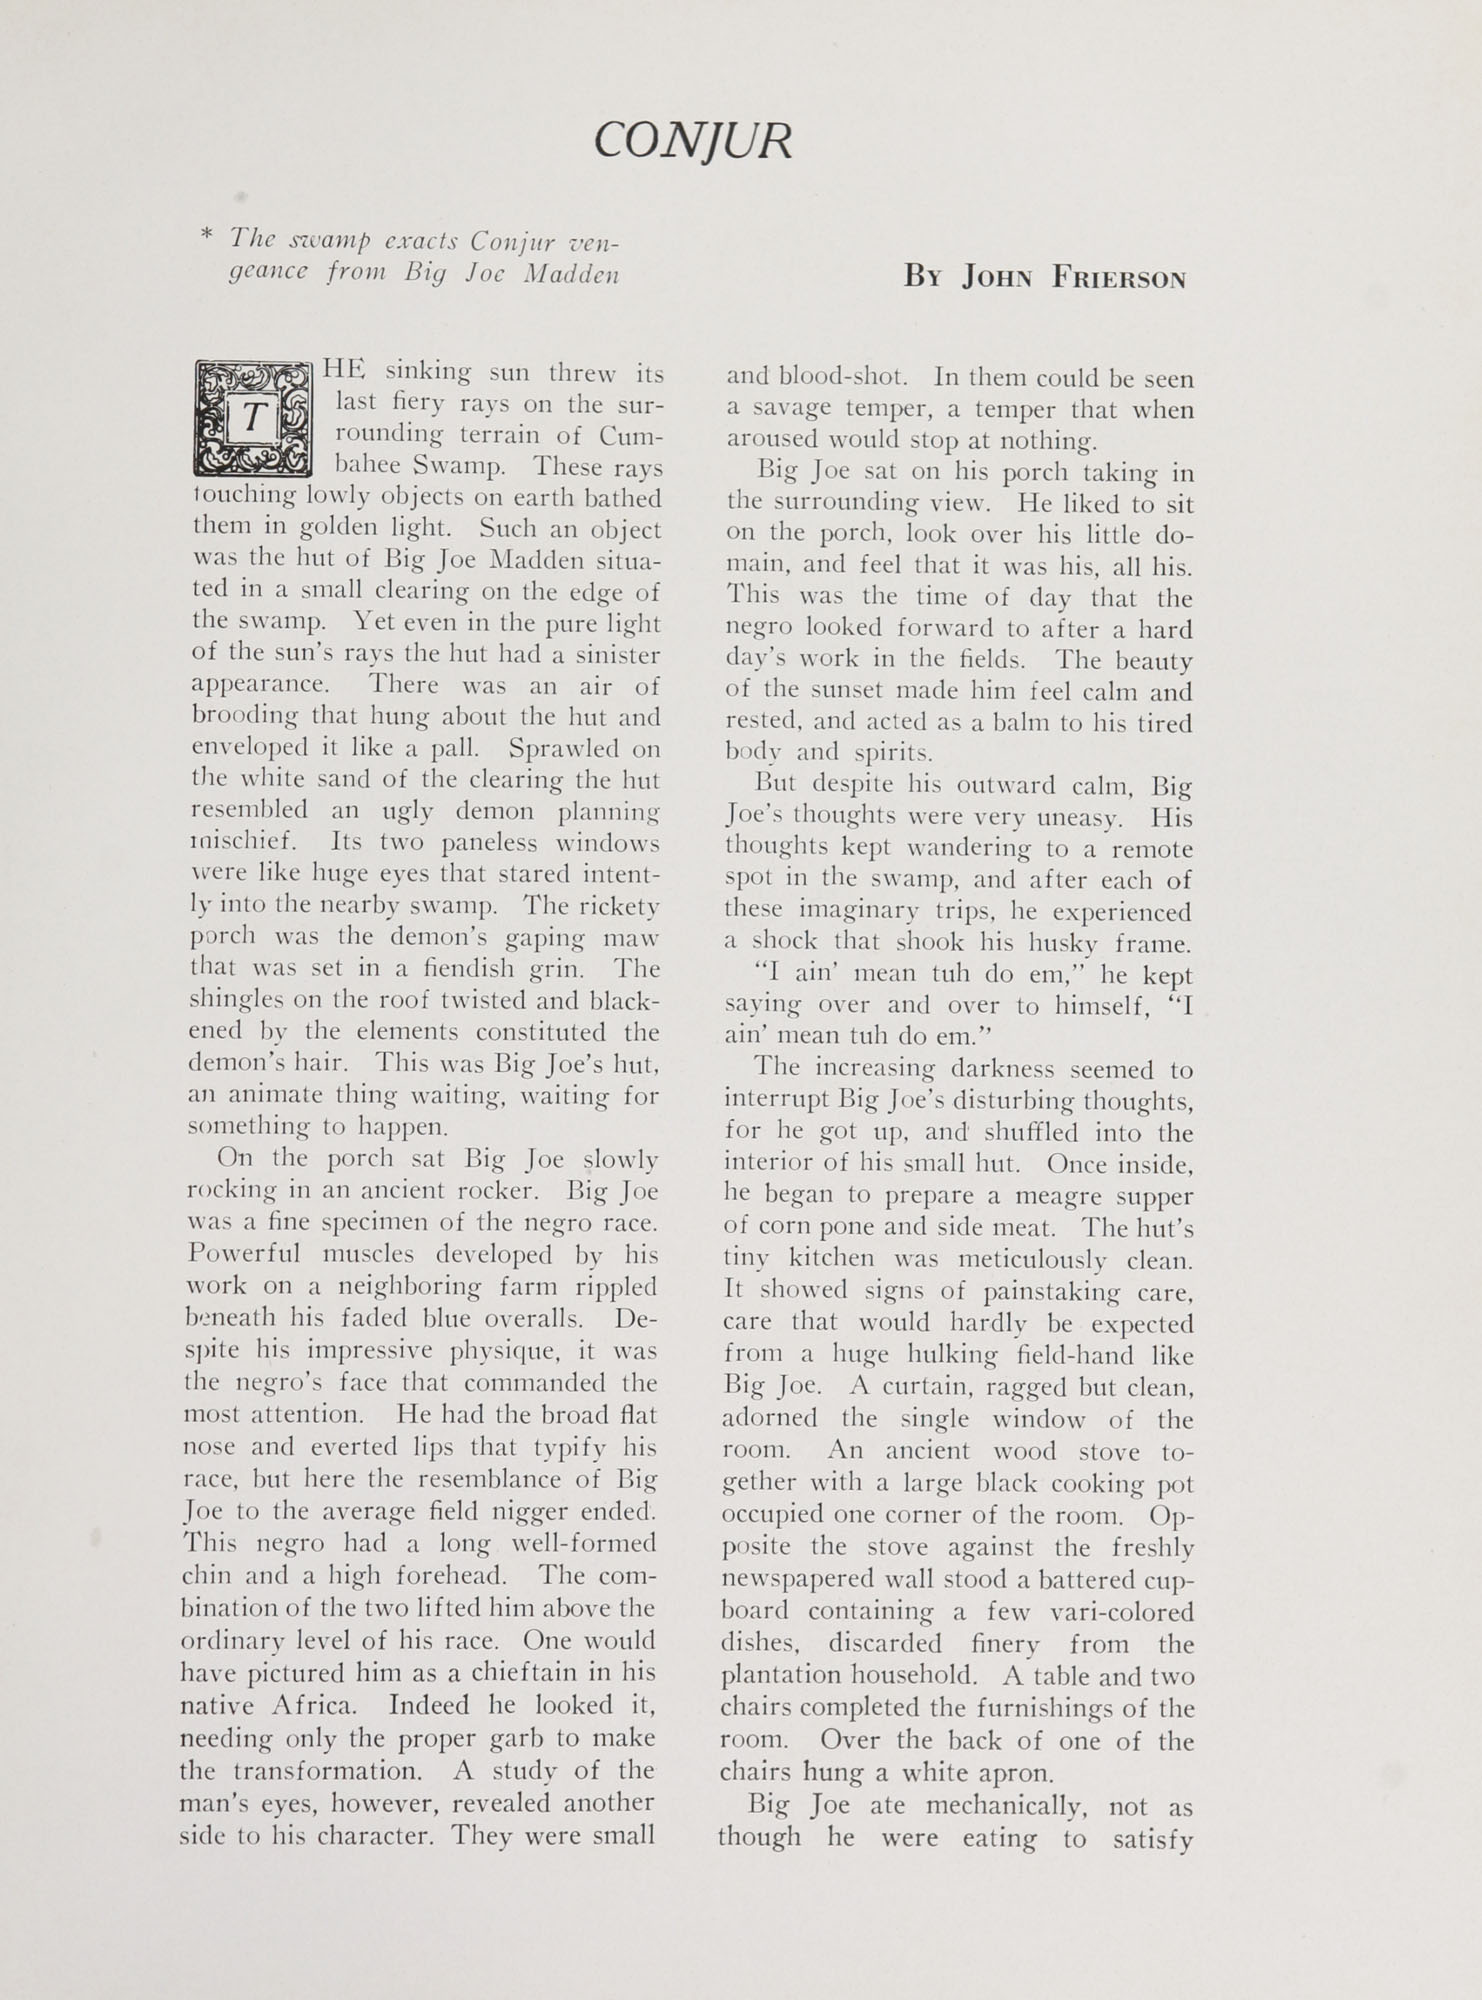 College of Charleston Magazine, 1938-1939, Vol. XXXXII No. 1, page 7